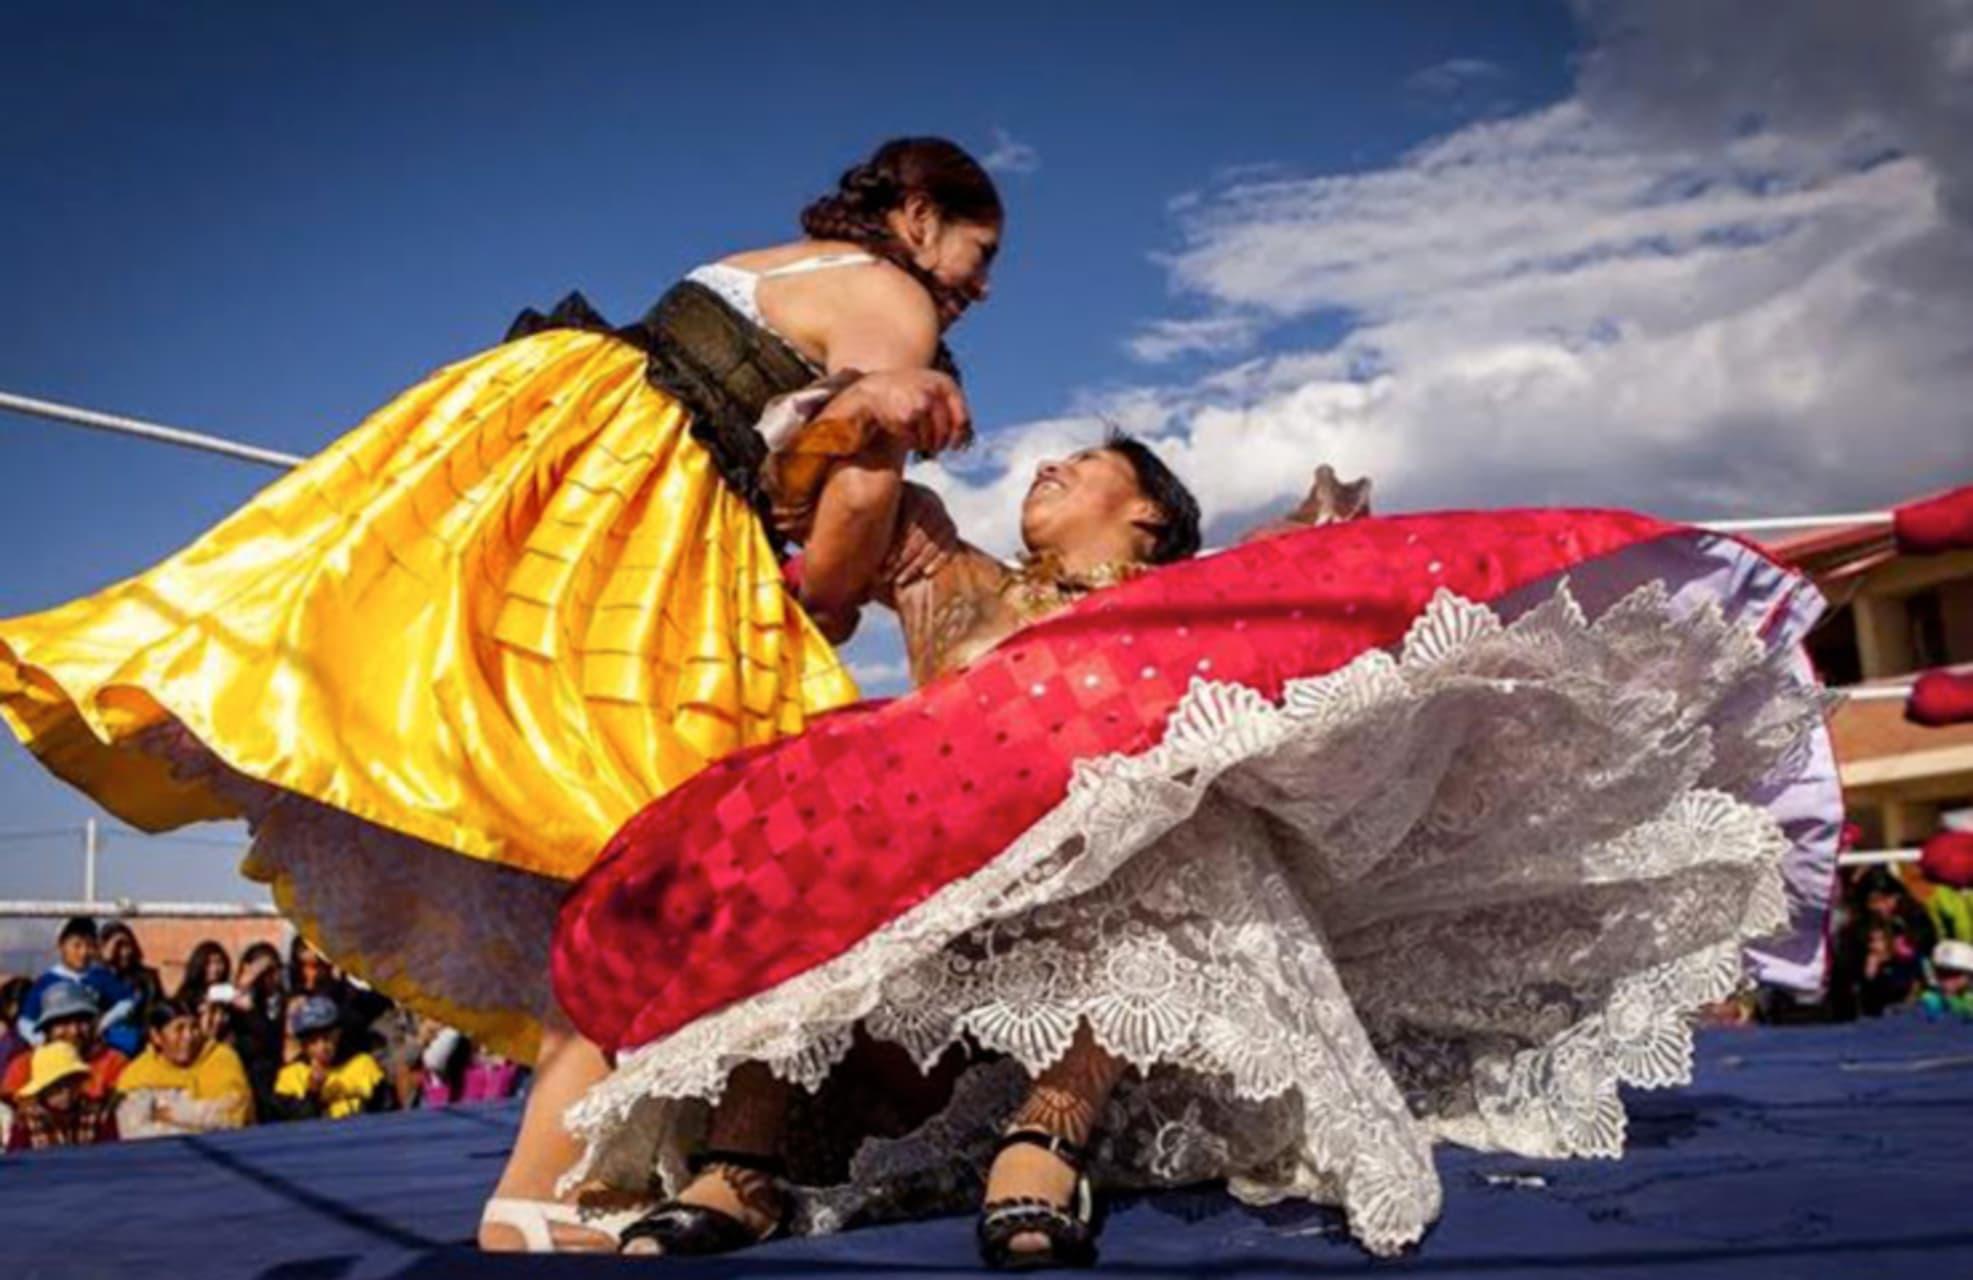 La Paz - Bolivian Cholitas Wrestling